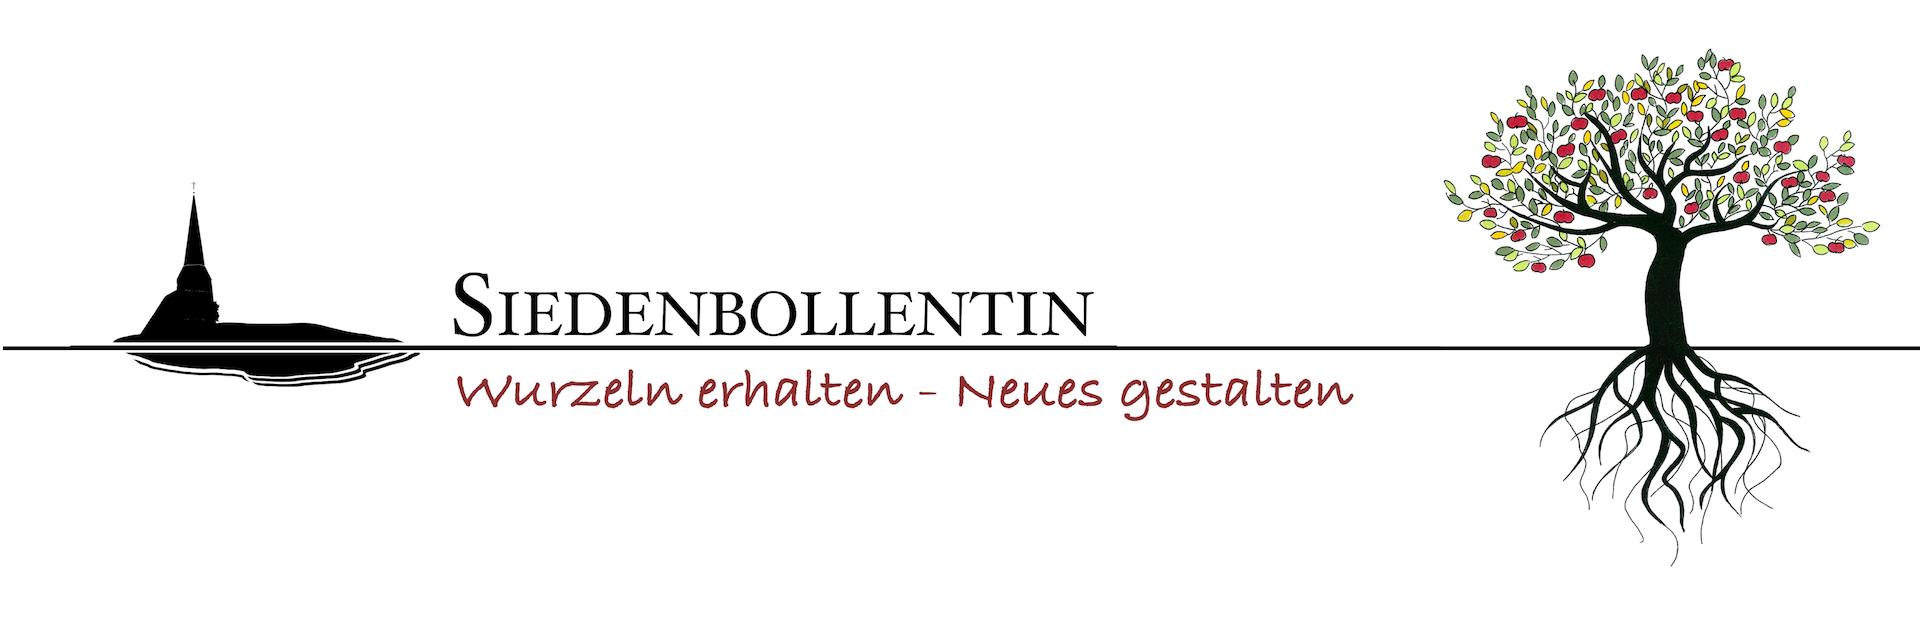 Siedenbollentin.de